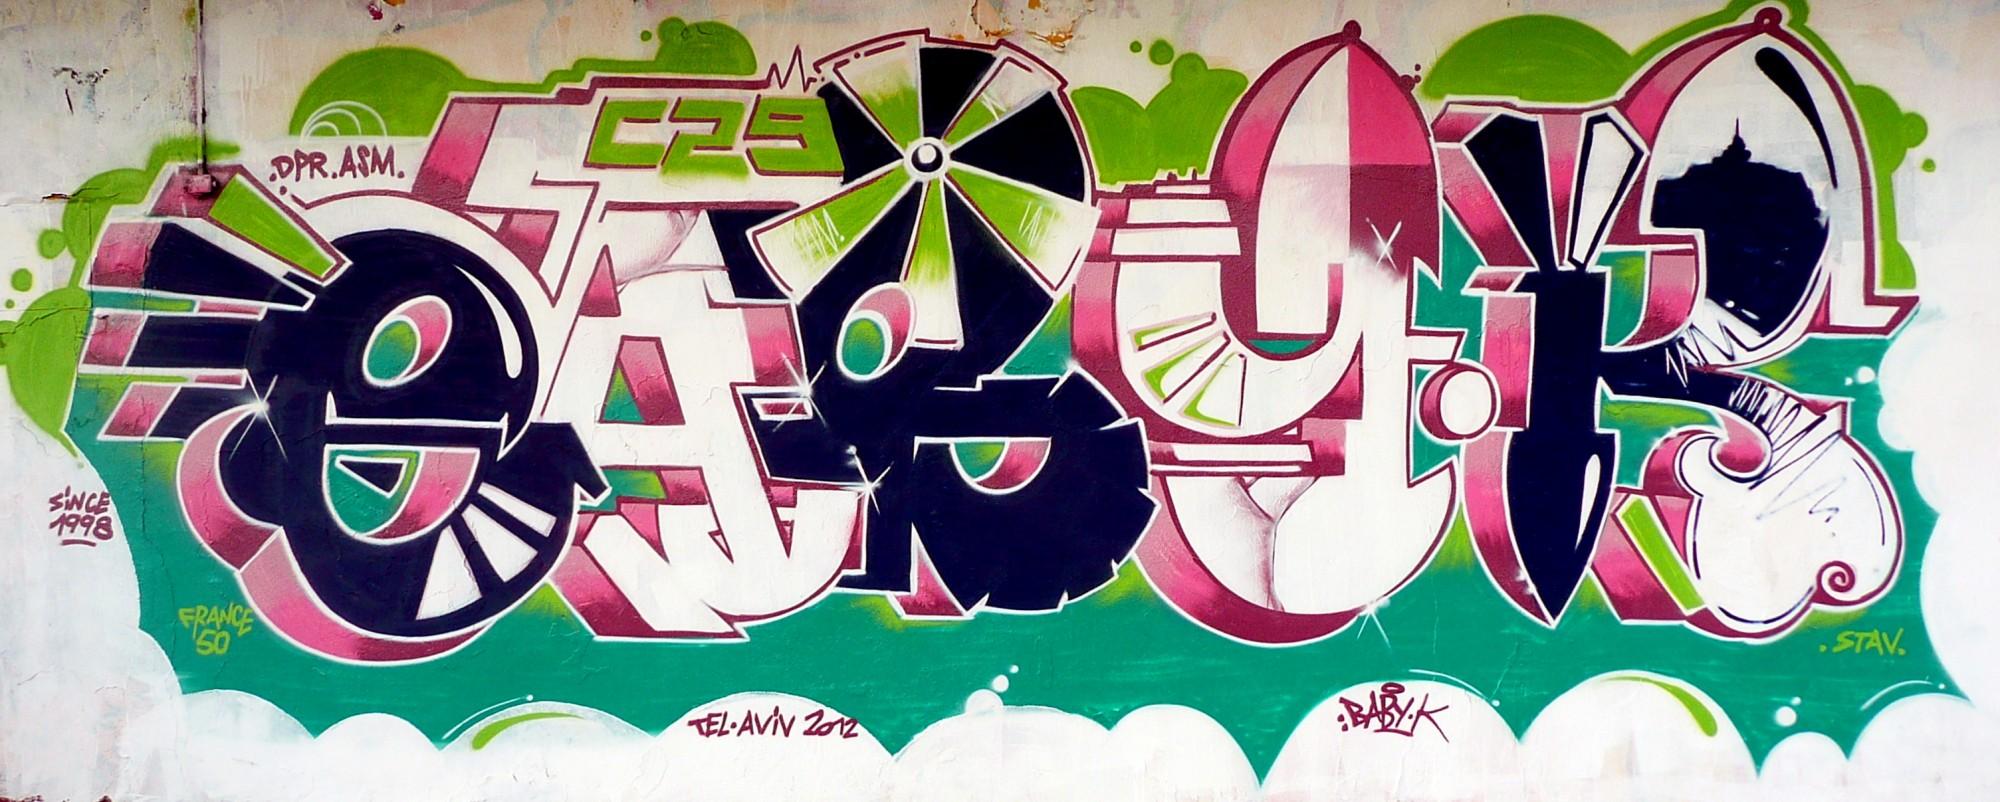 tel-aviv2012